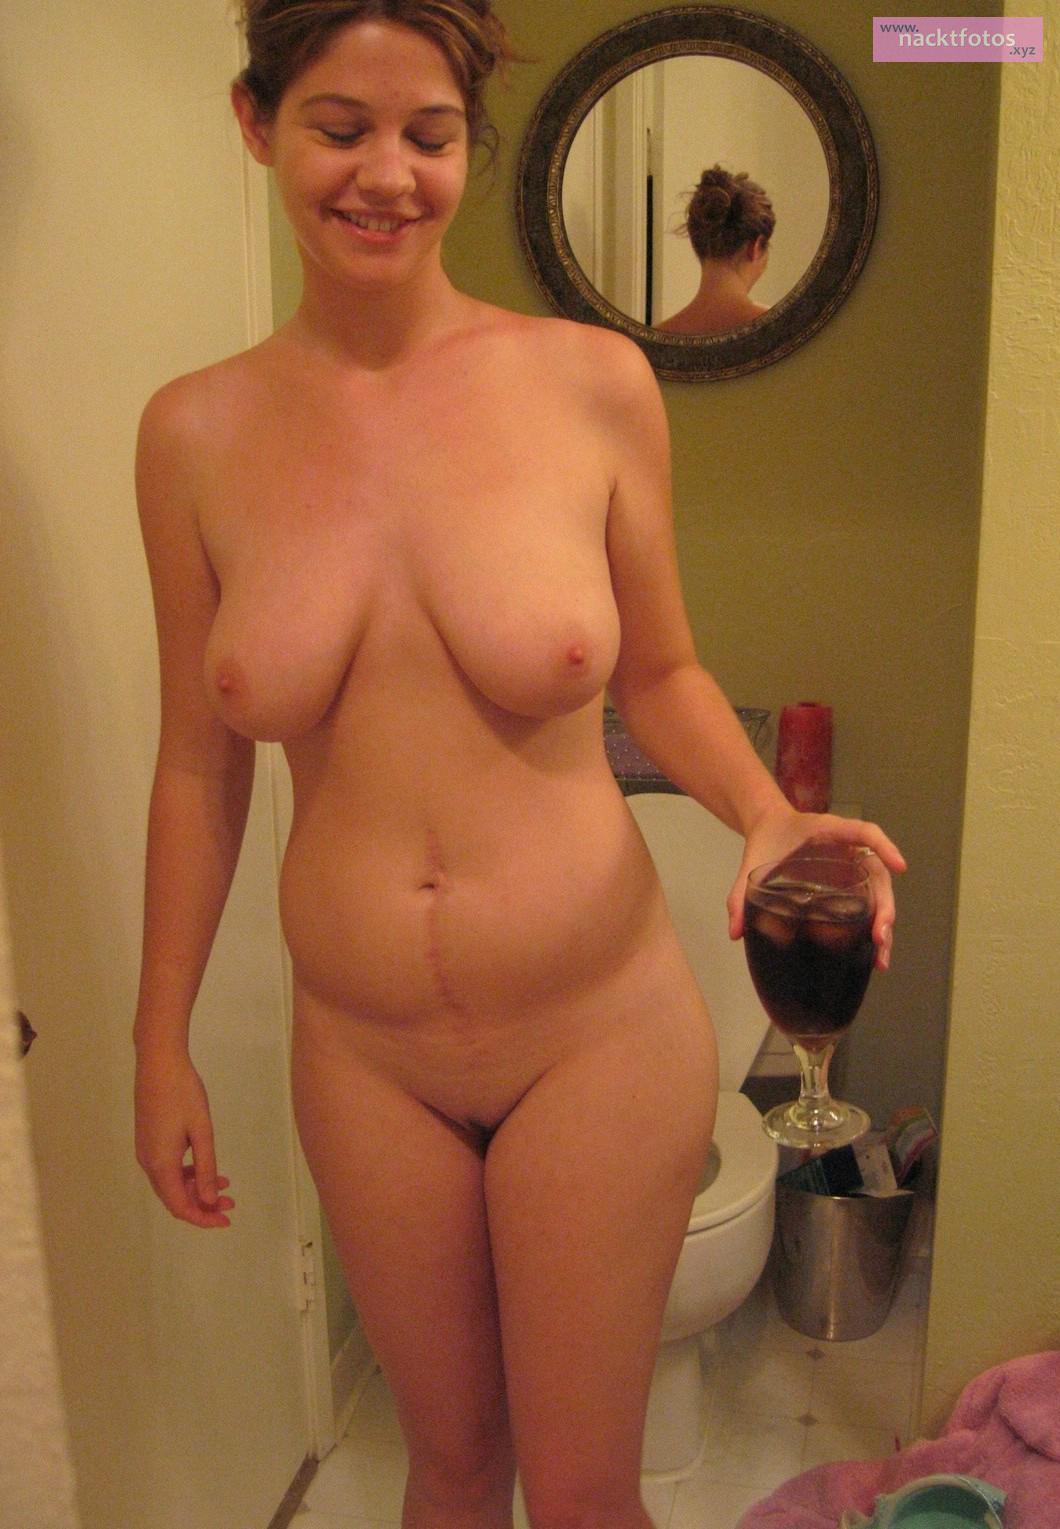 Bilder tanja nackt ᐉ Nackt